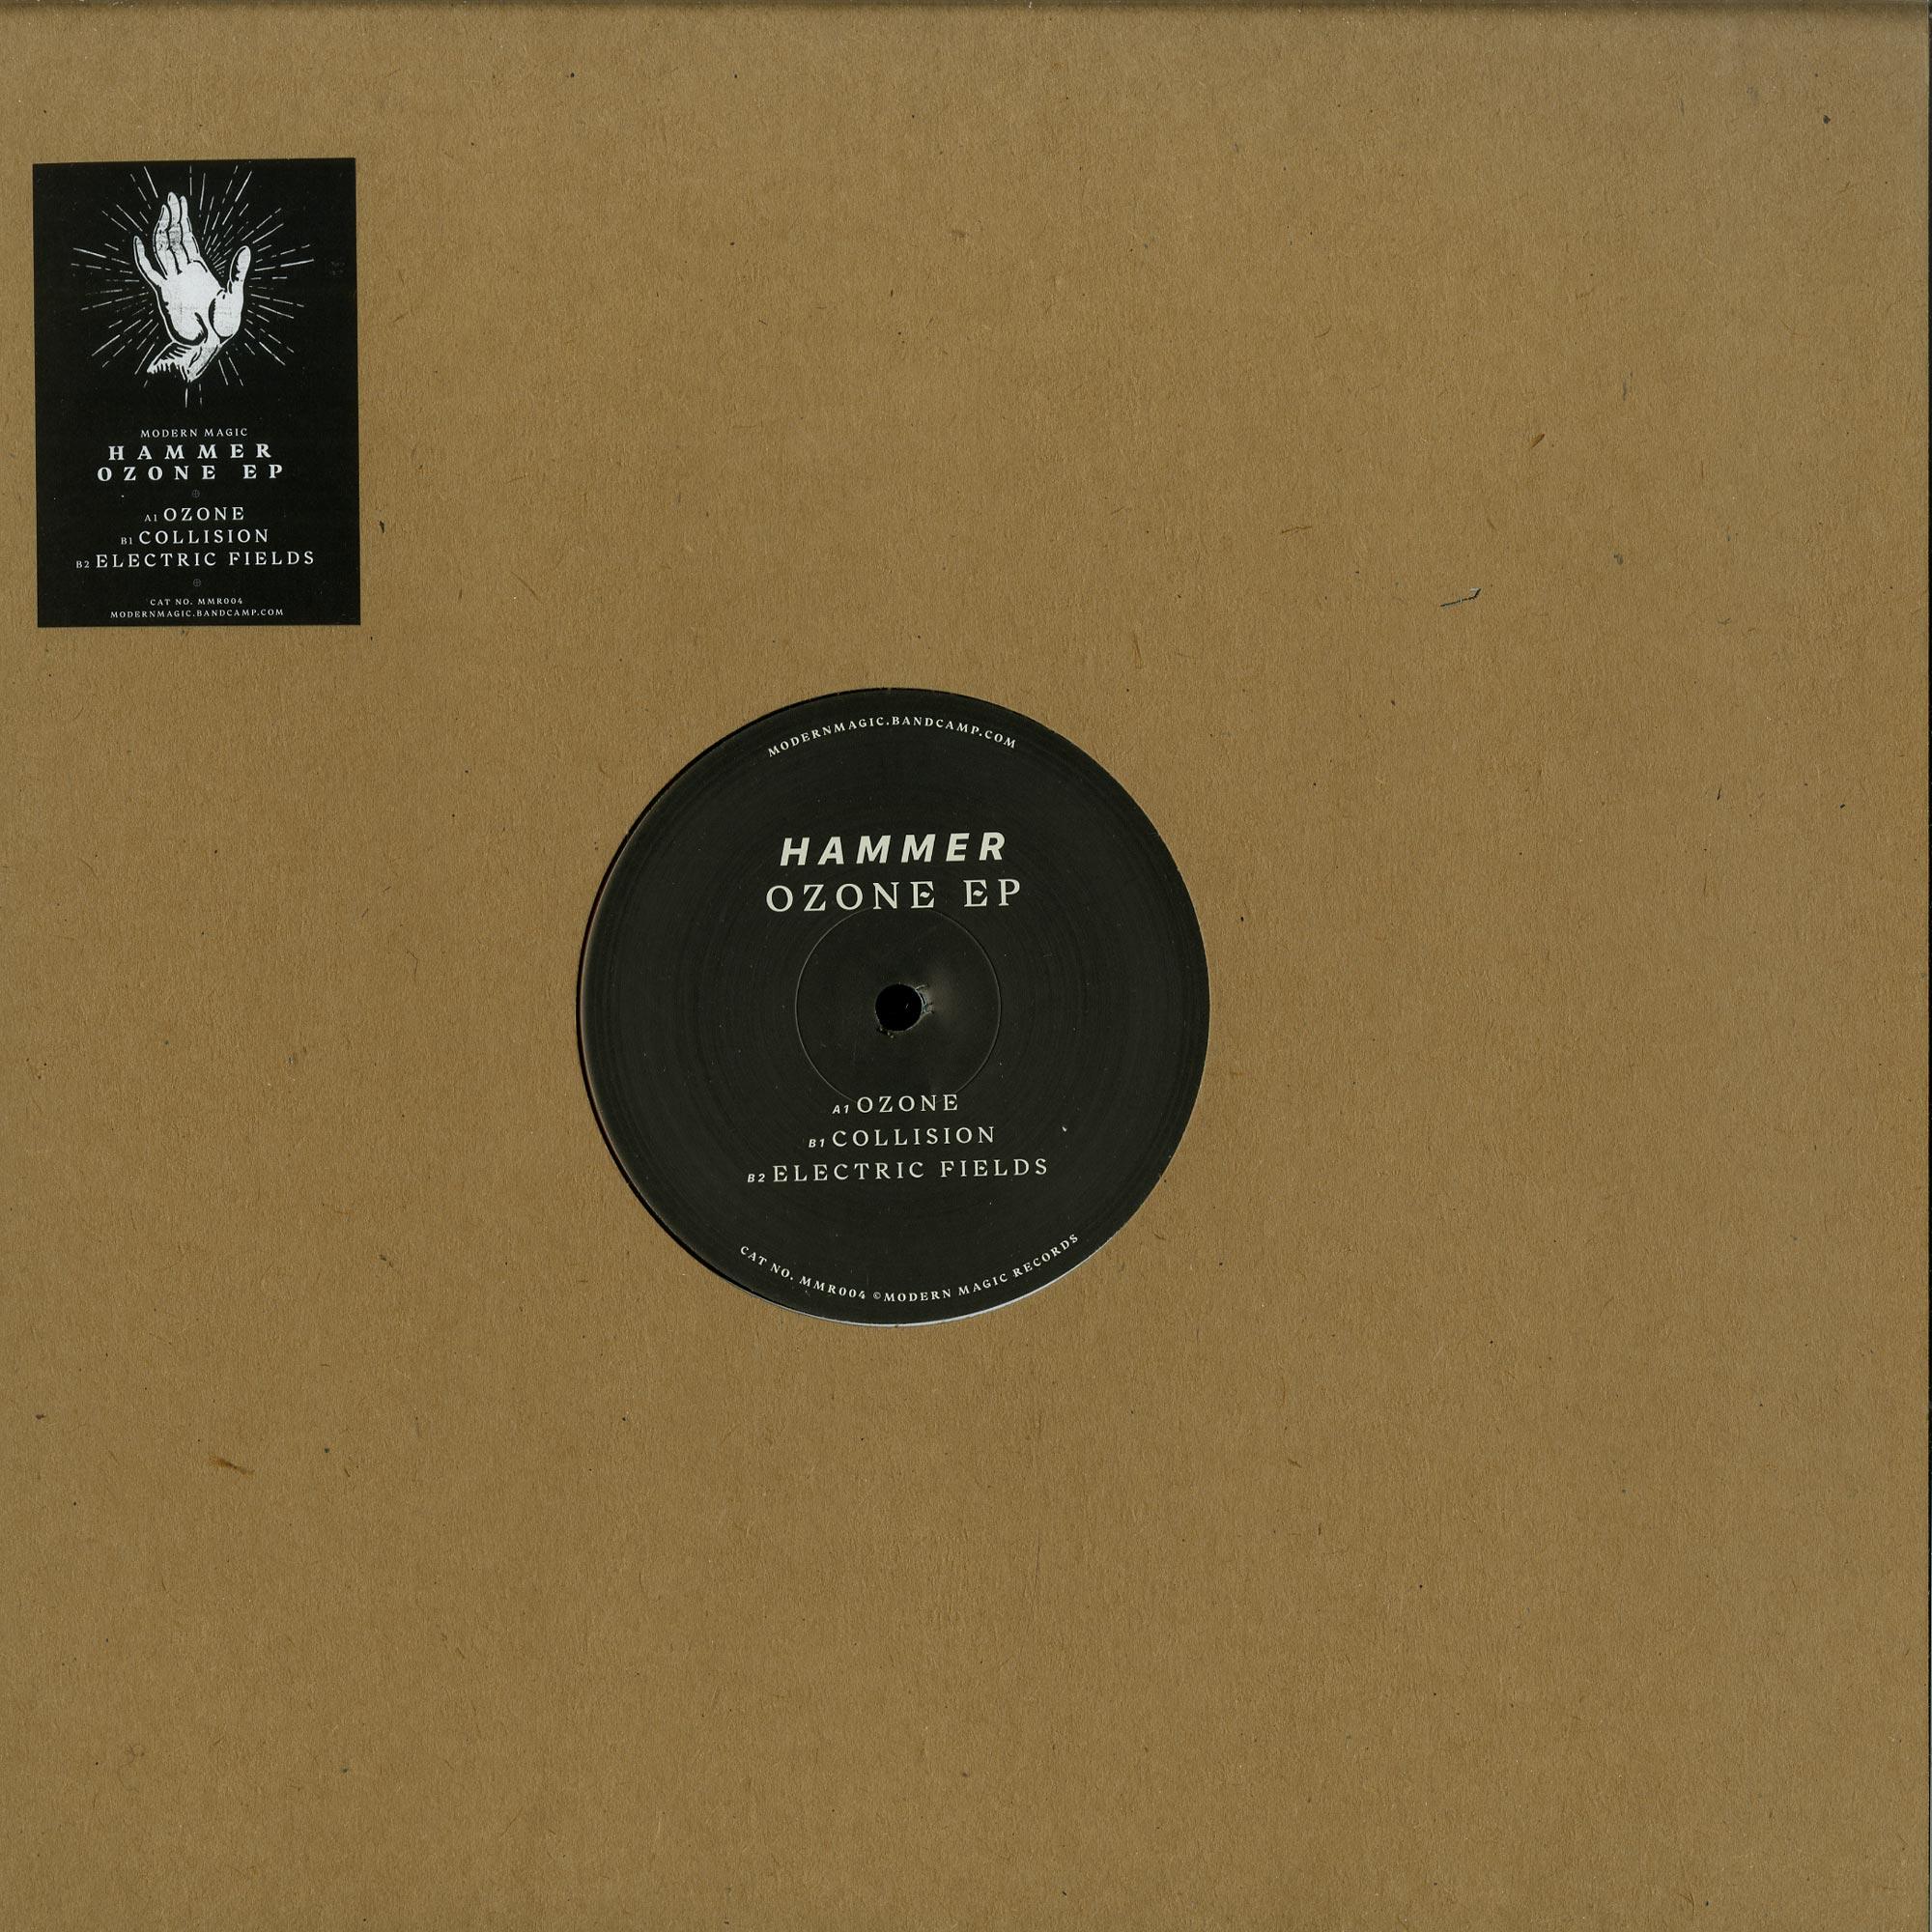 Hammer - OZONE EP